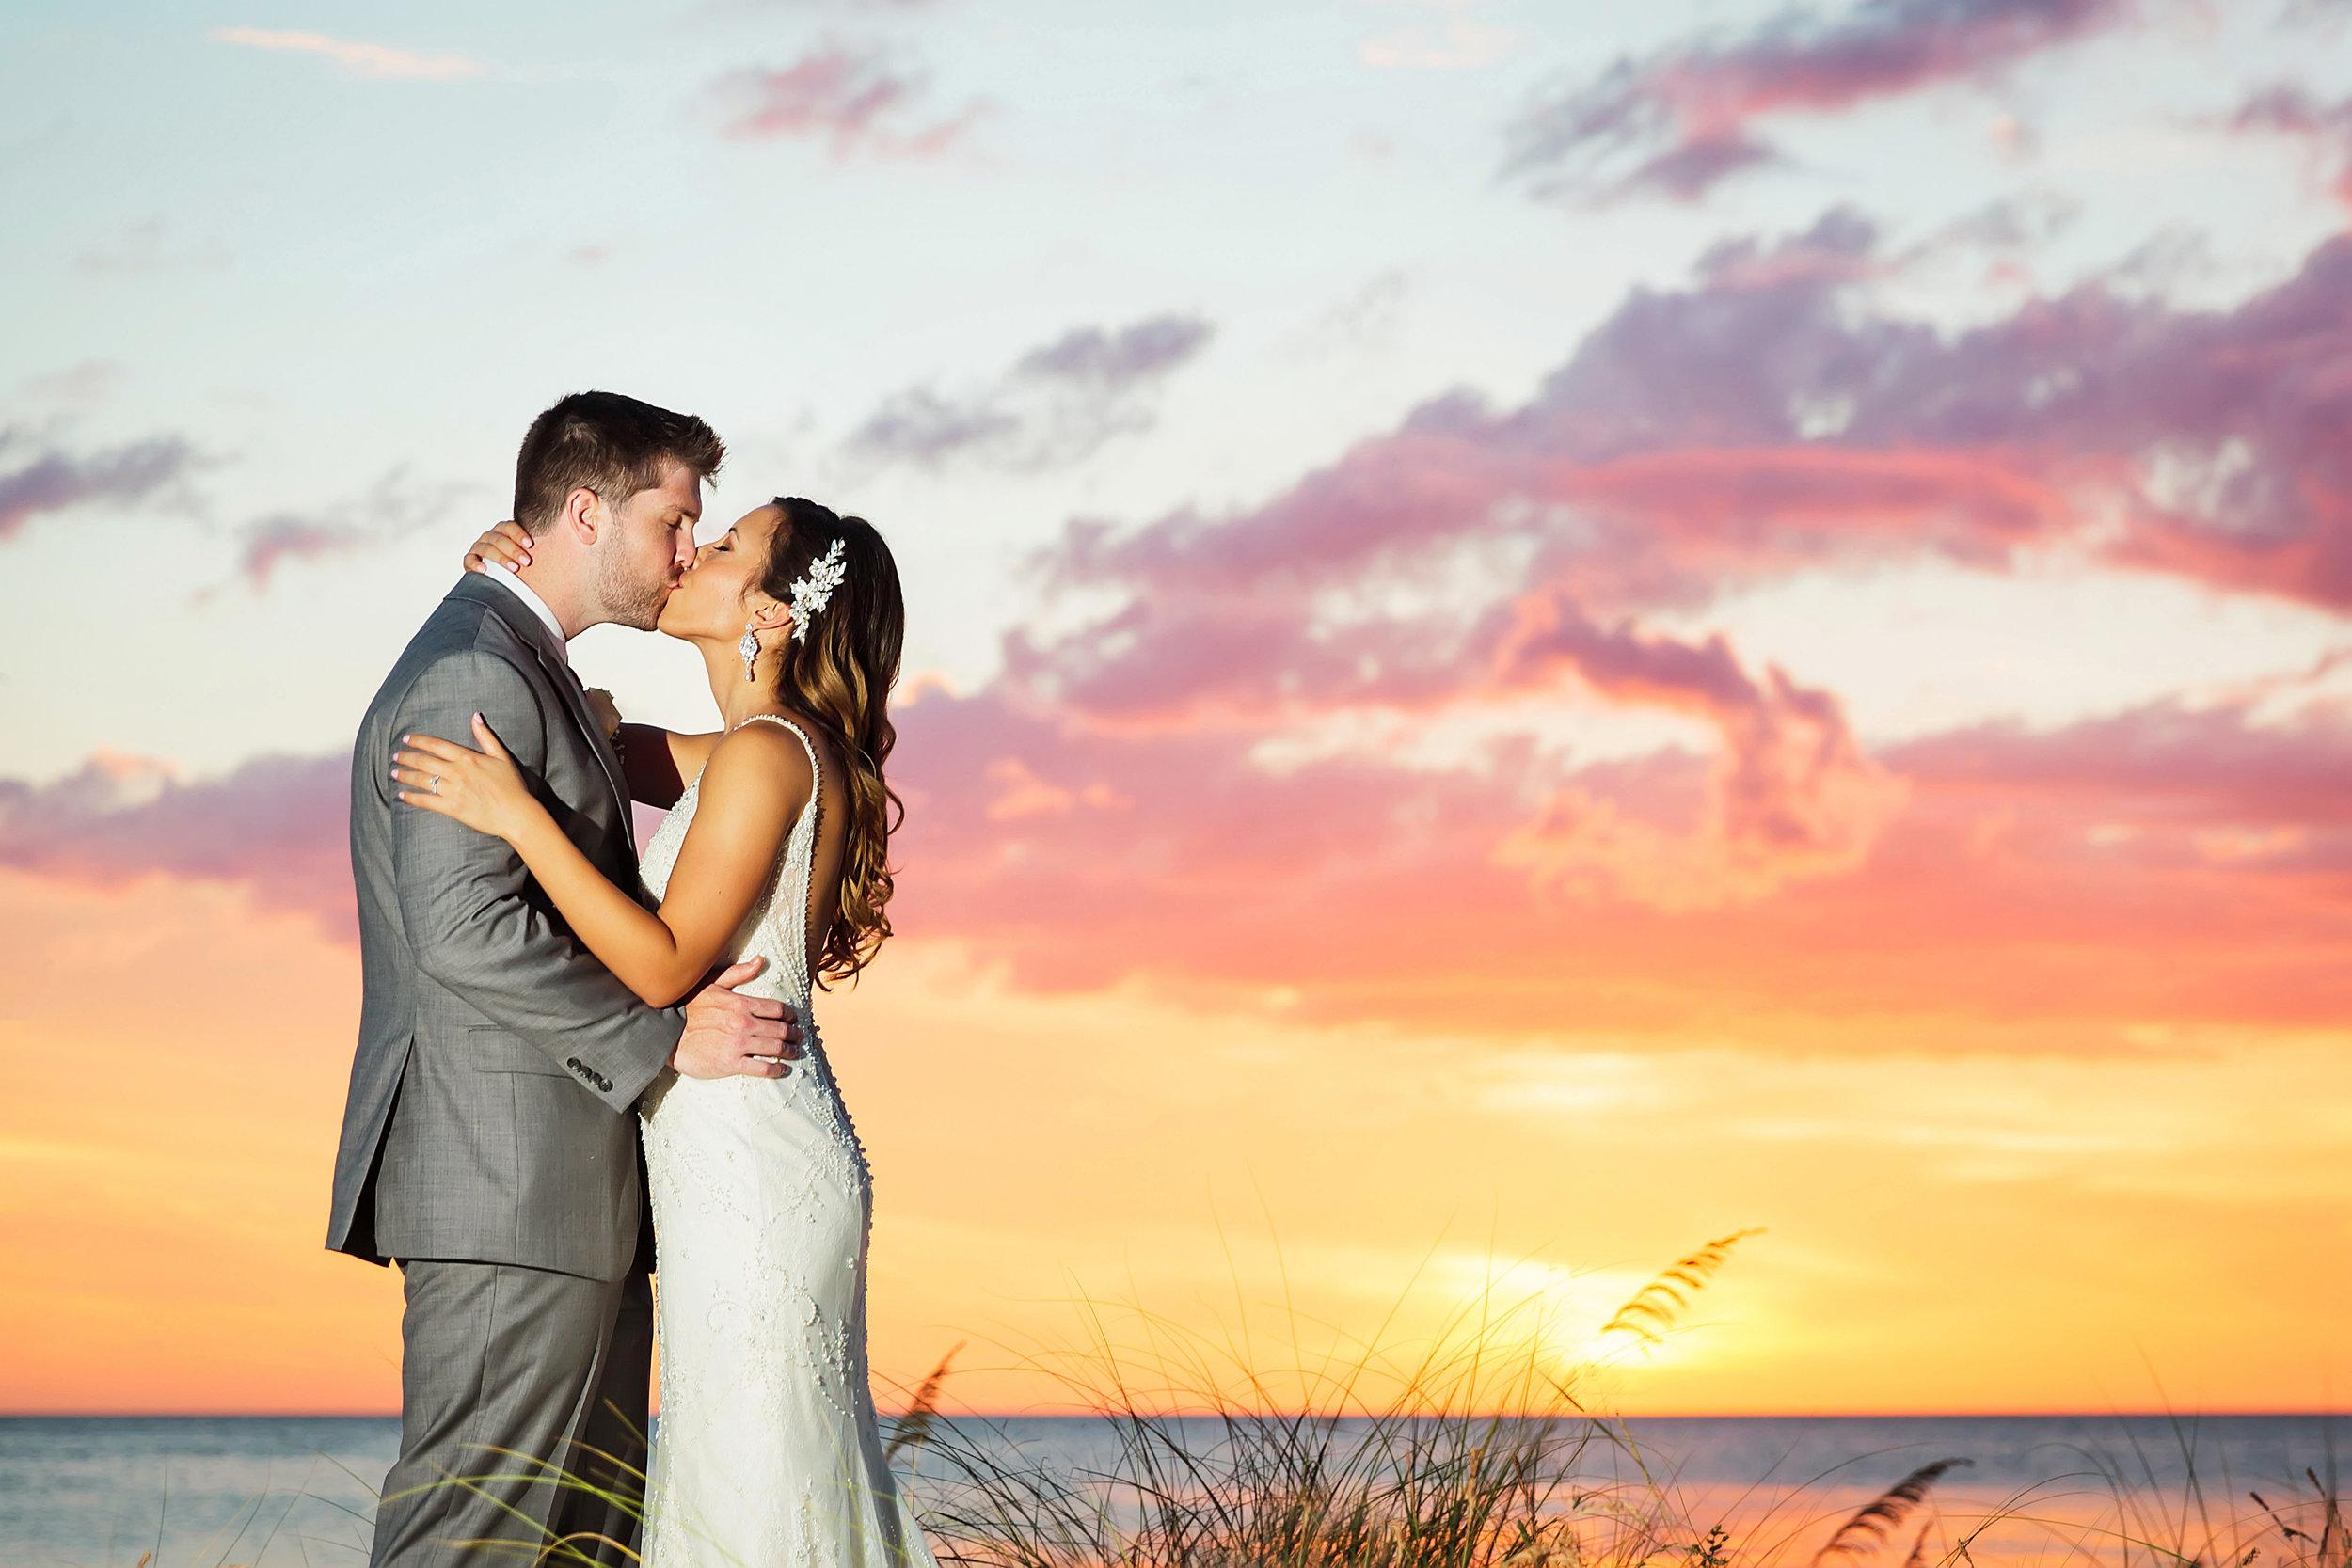 hyatt clearwater beach, sunset, romance, kiss, ocean, beach, wedding photography, limelight photography